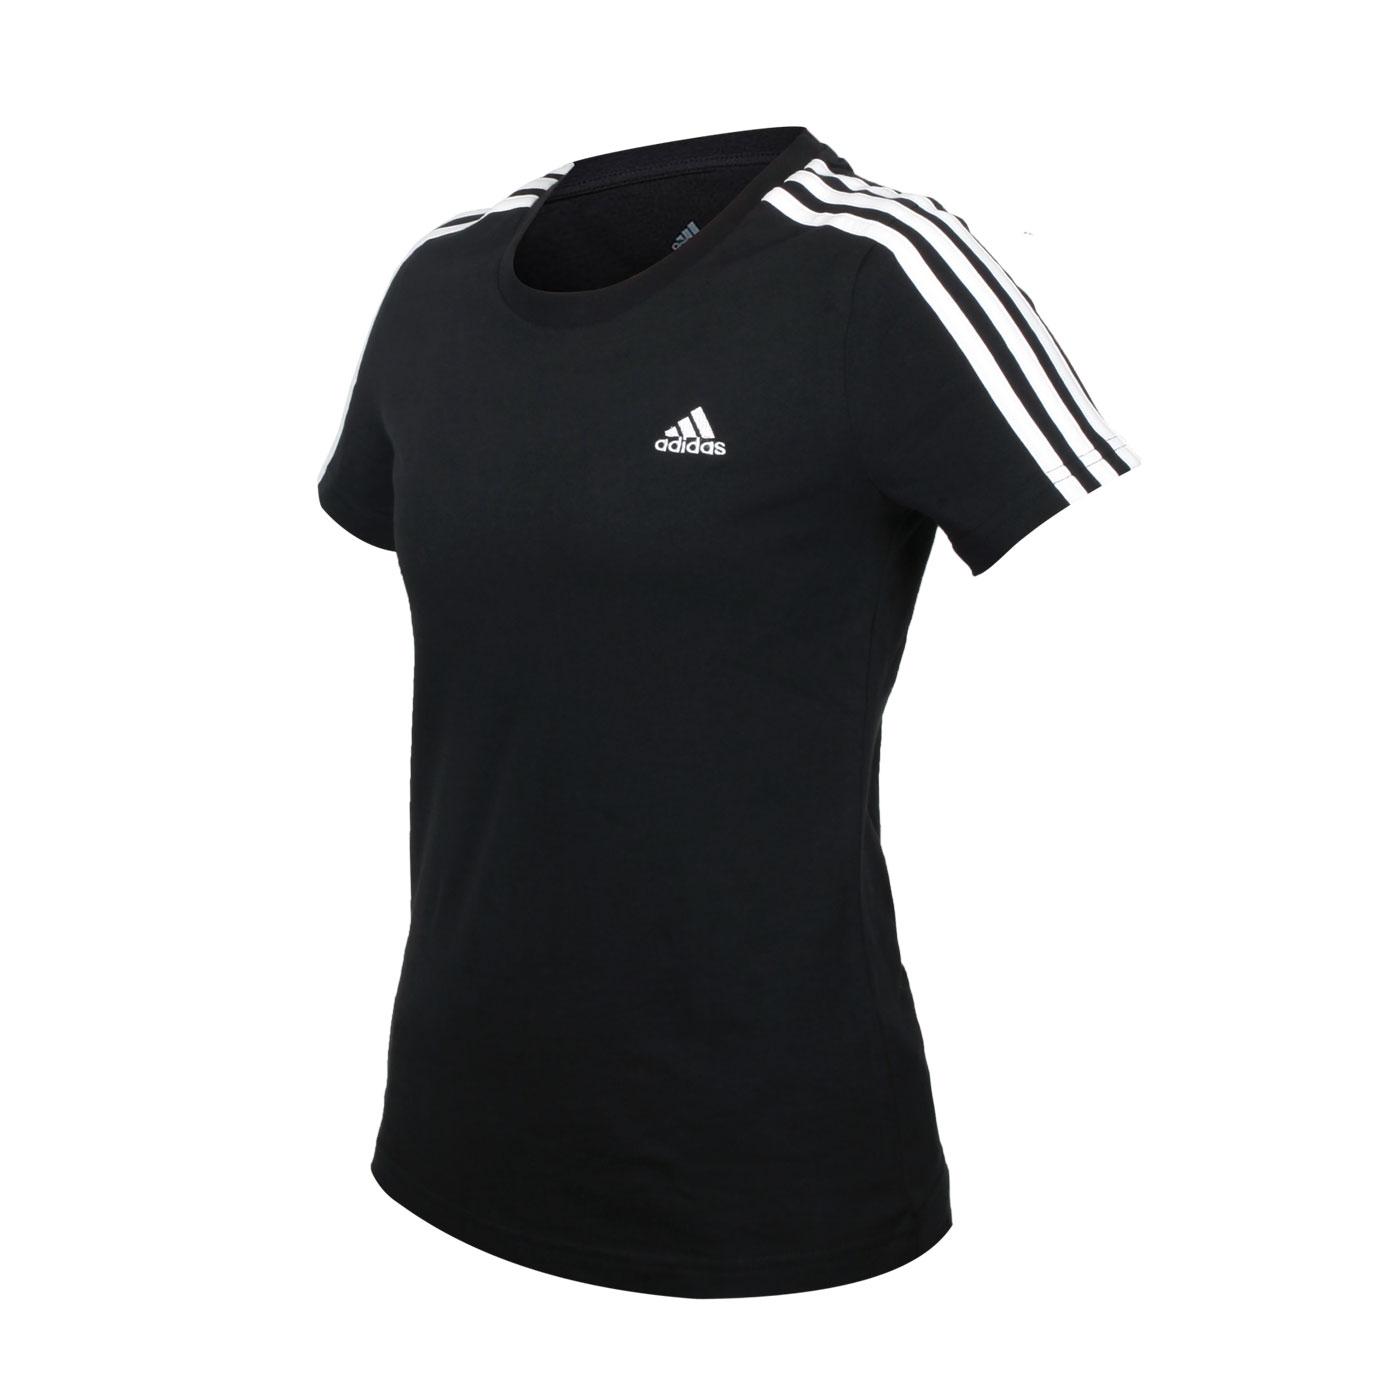 ADIDAS 女款短袖T恤 GL0784